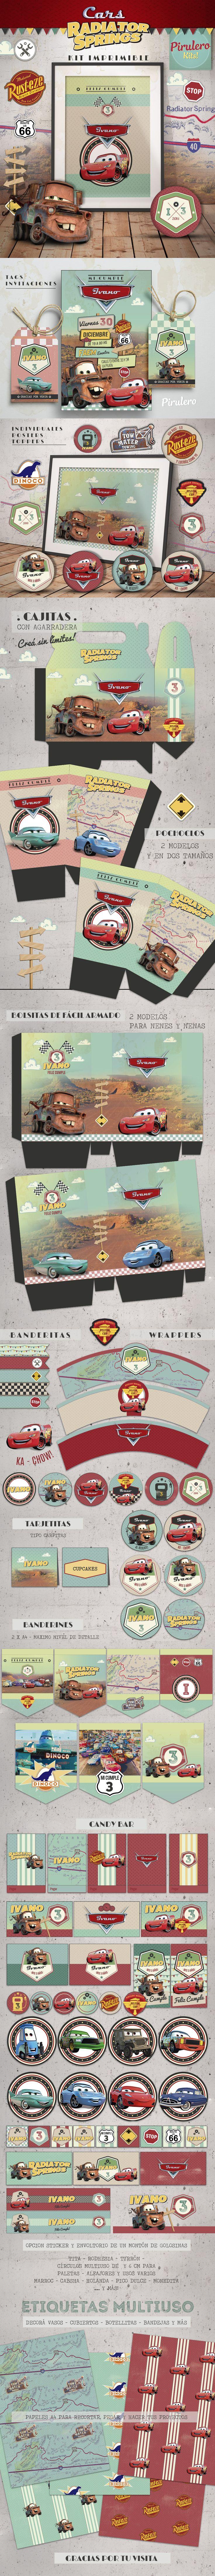 Kit imprimible Cars de Pirulero #Cars #disneyCars #RayoMcQueen #TownMater #dinococo #RadiatorSprings #RustEze #CarsParty